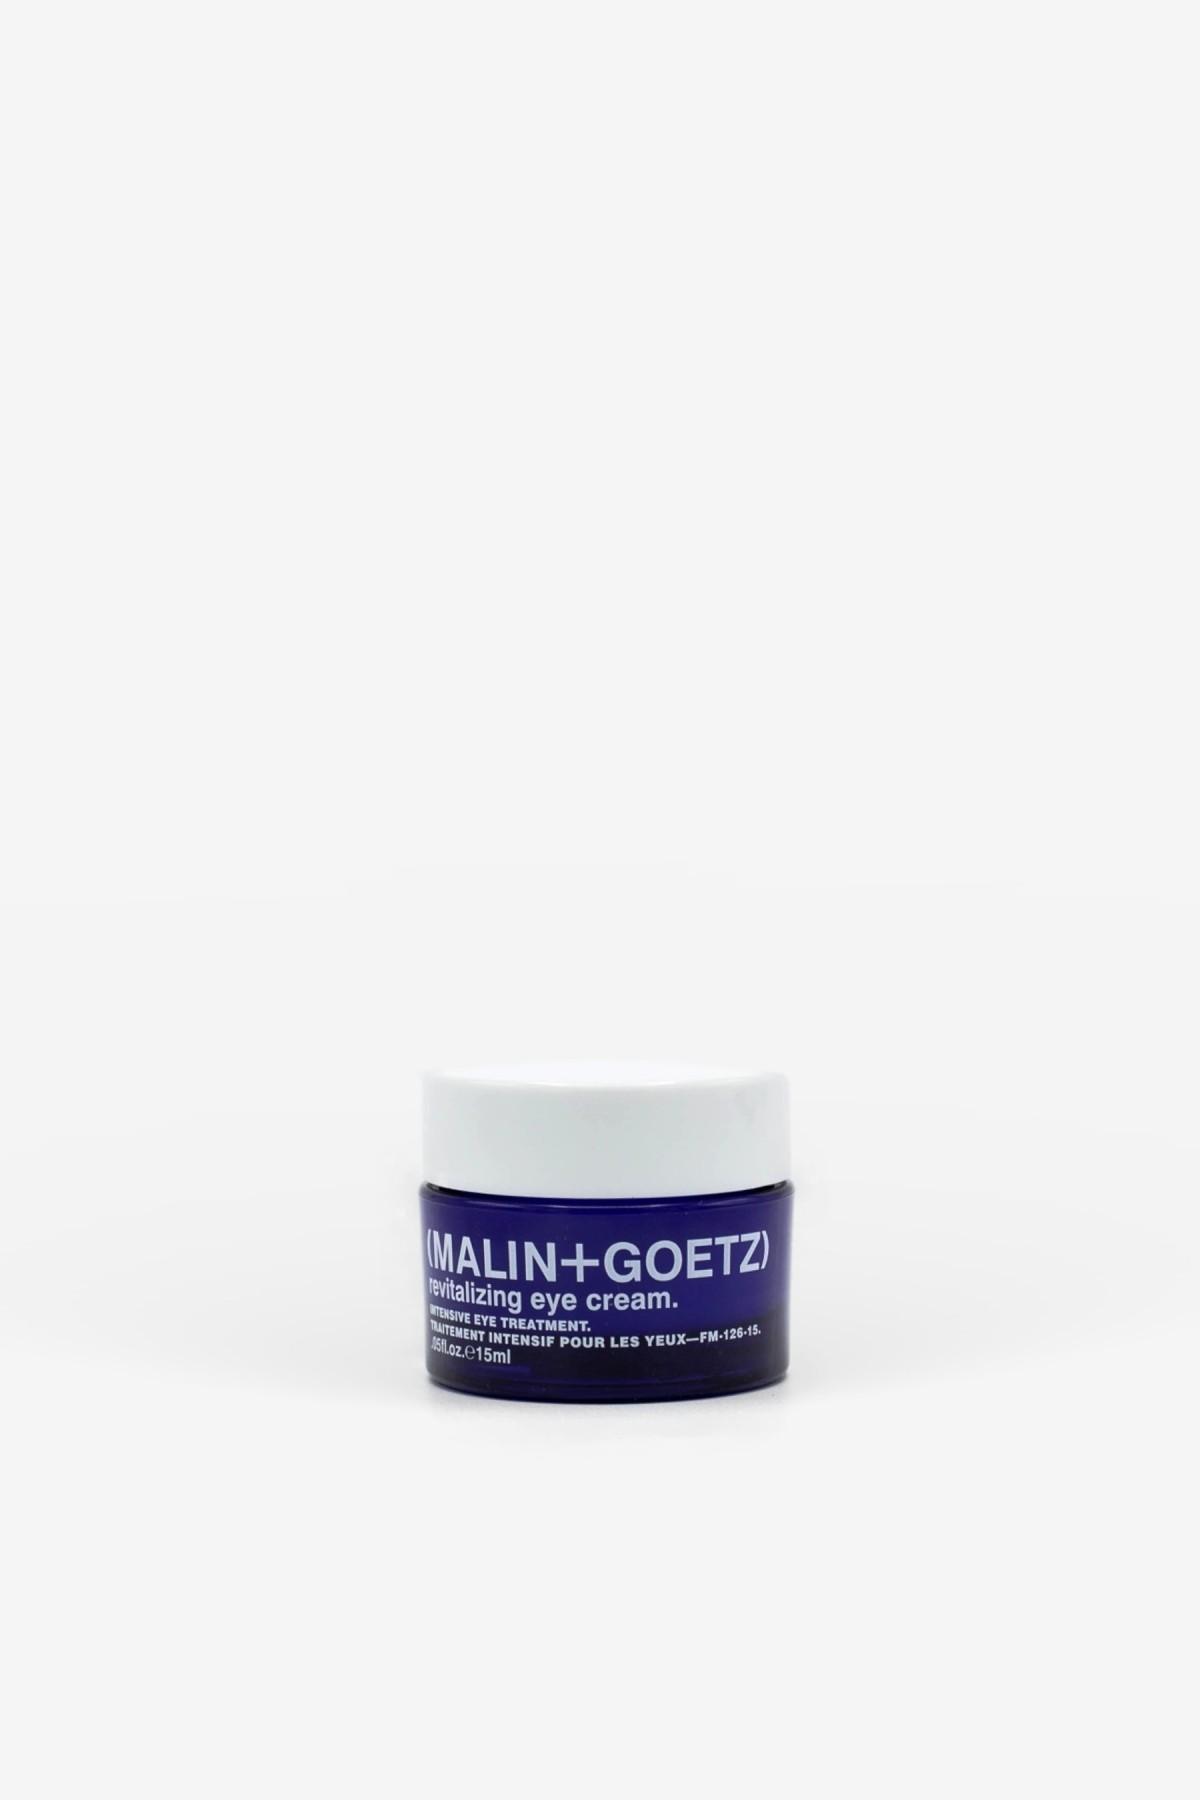 Malin+Goetz Revitalizing Eye Cream 15ml in